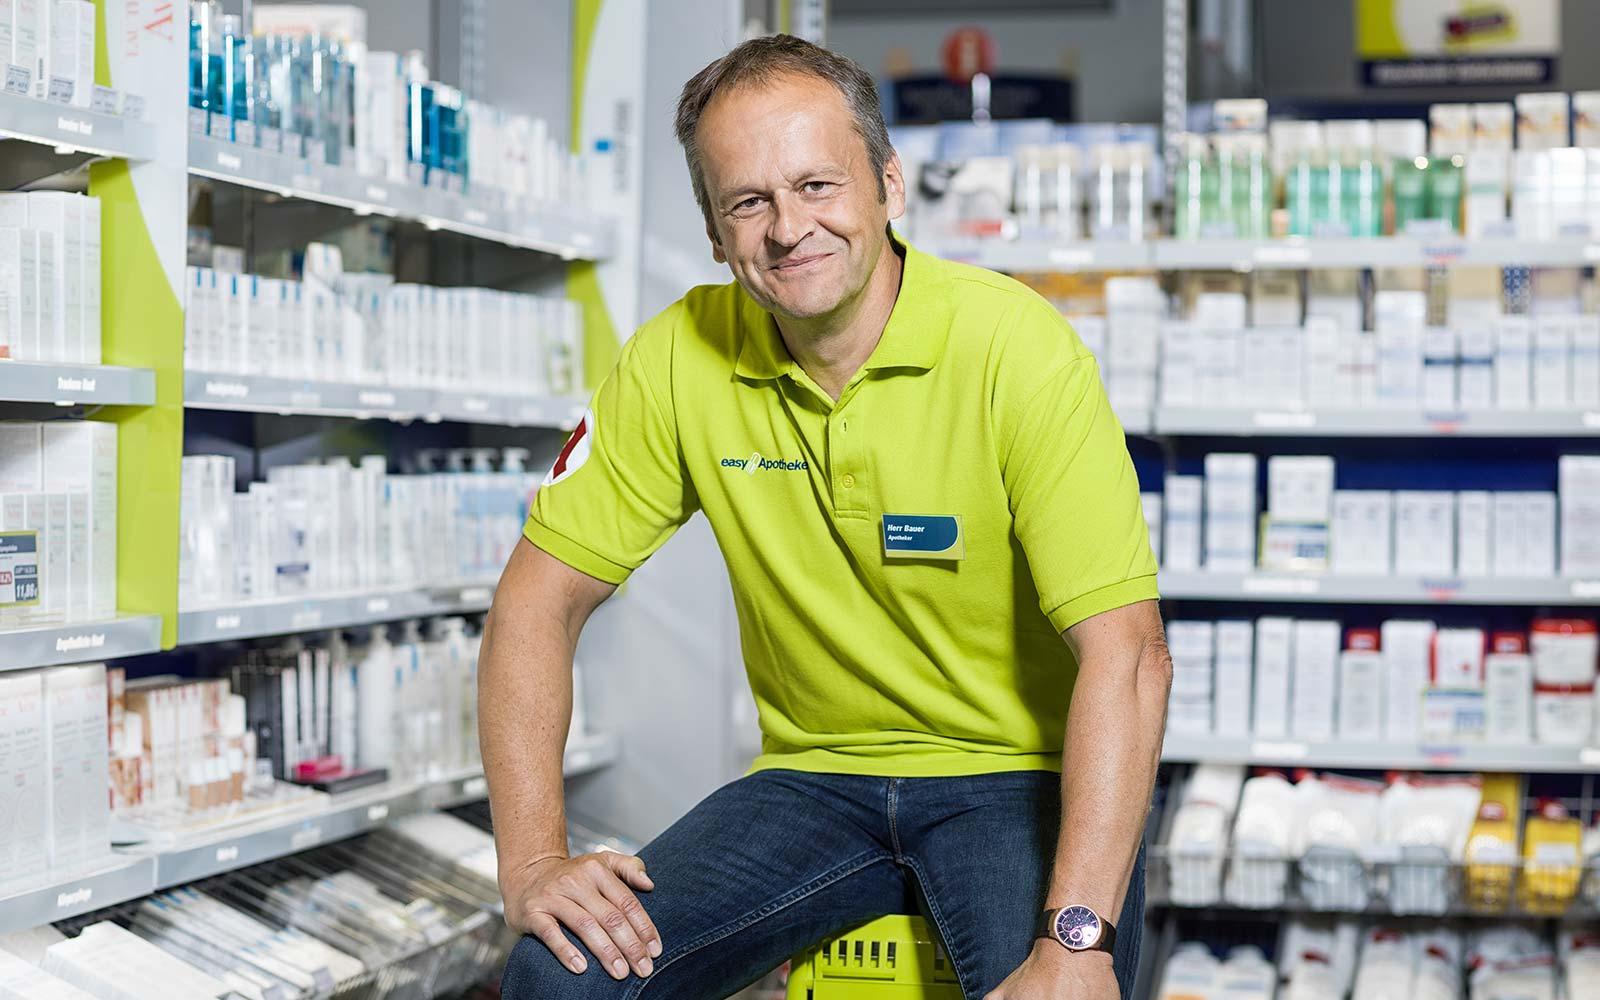 Apotheker Wolfgang Bauer in der Offizin seiner easyApotheke in Bayreuth